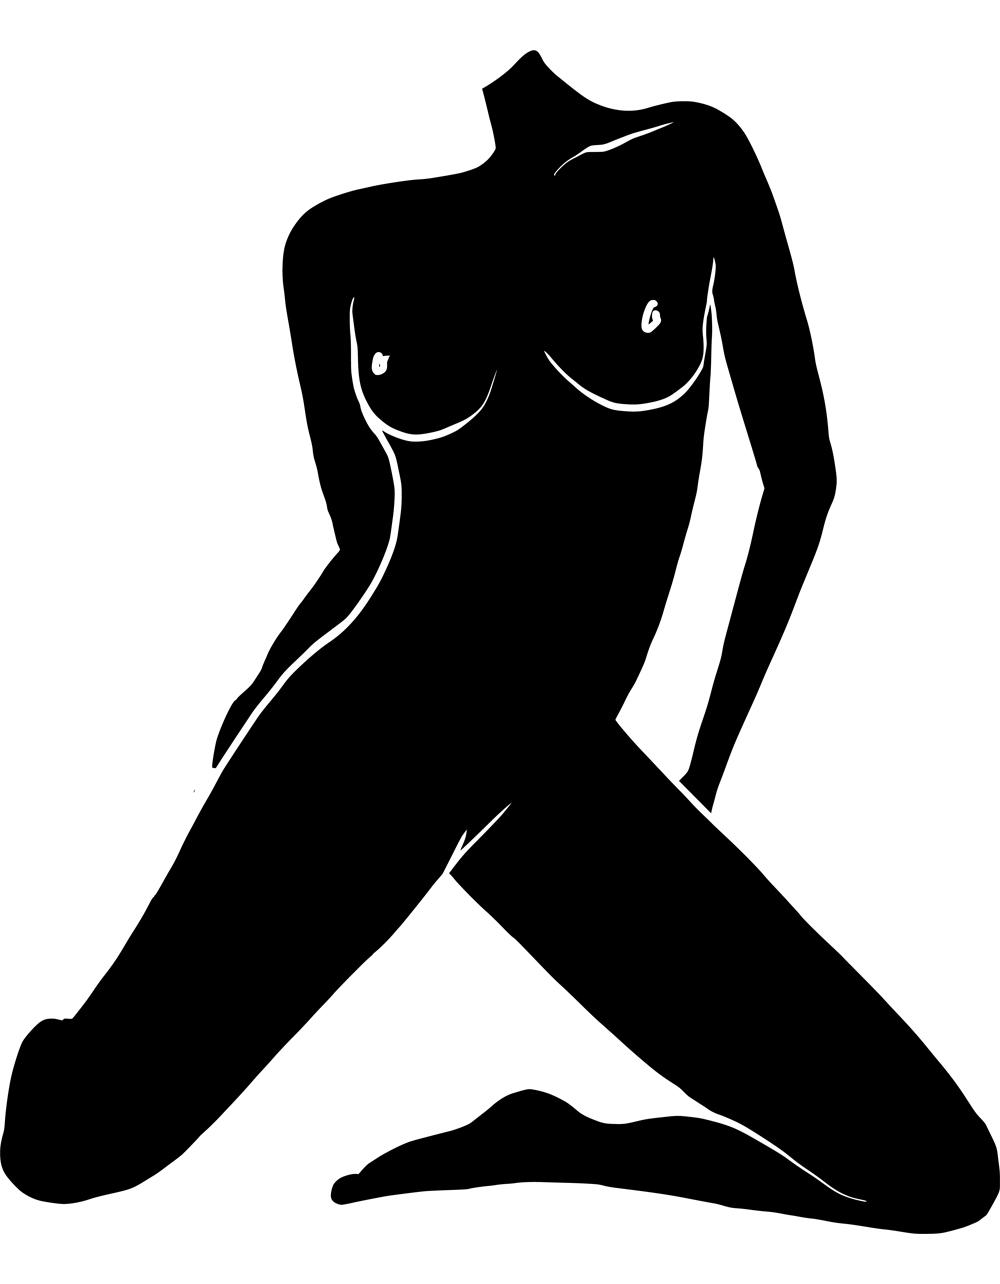 Appeal of BDSM